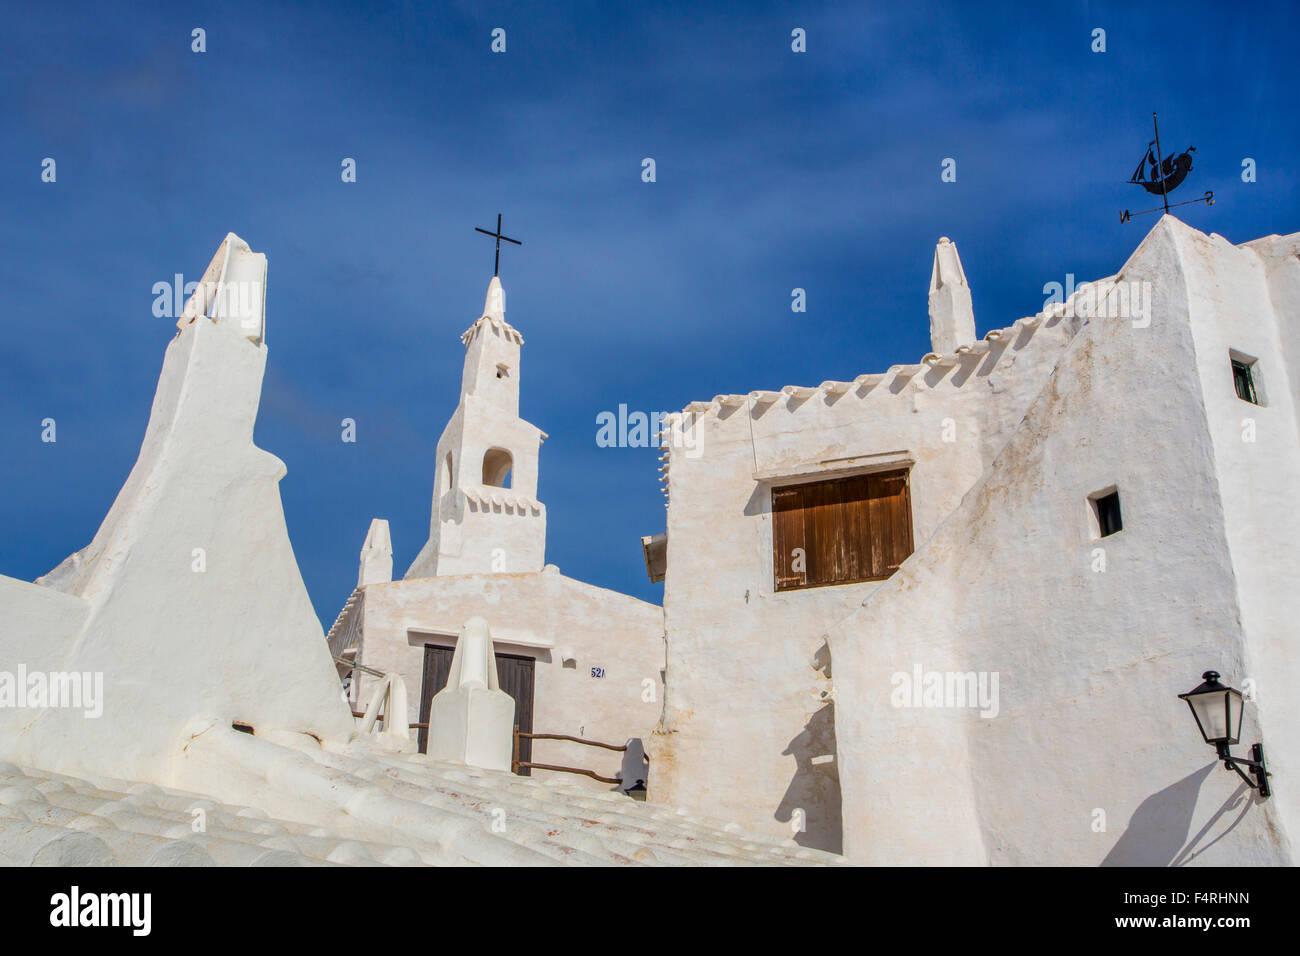 Binibeca, Fishing, Landscape, Menorca, Balearics, Spain, Europe, Spring, Village, architecture, Balearic, island, - Stock Image